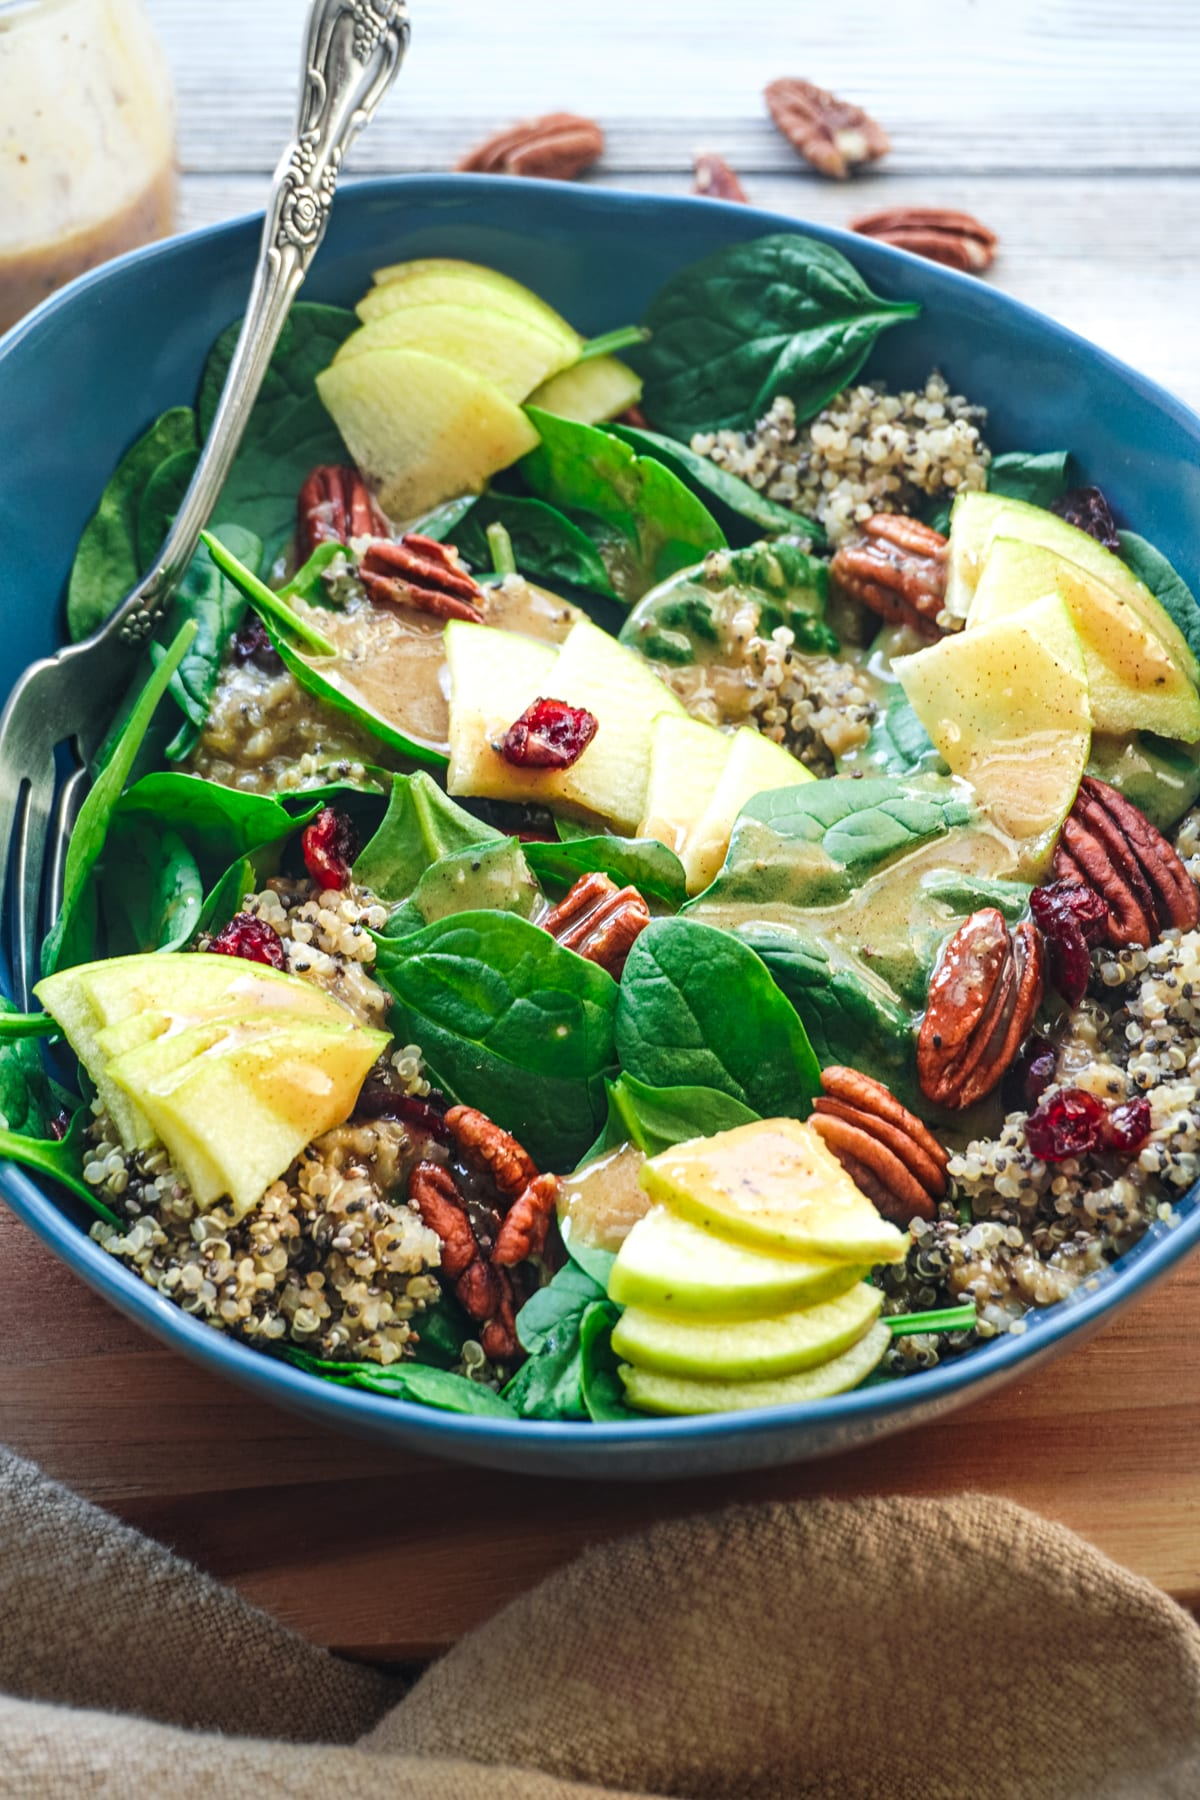 fall salad, fall salad recipes, autumn salad, autumn salad recipes, best fall salads, Vegan fall salad, Best fall salad, Apple salad,